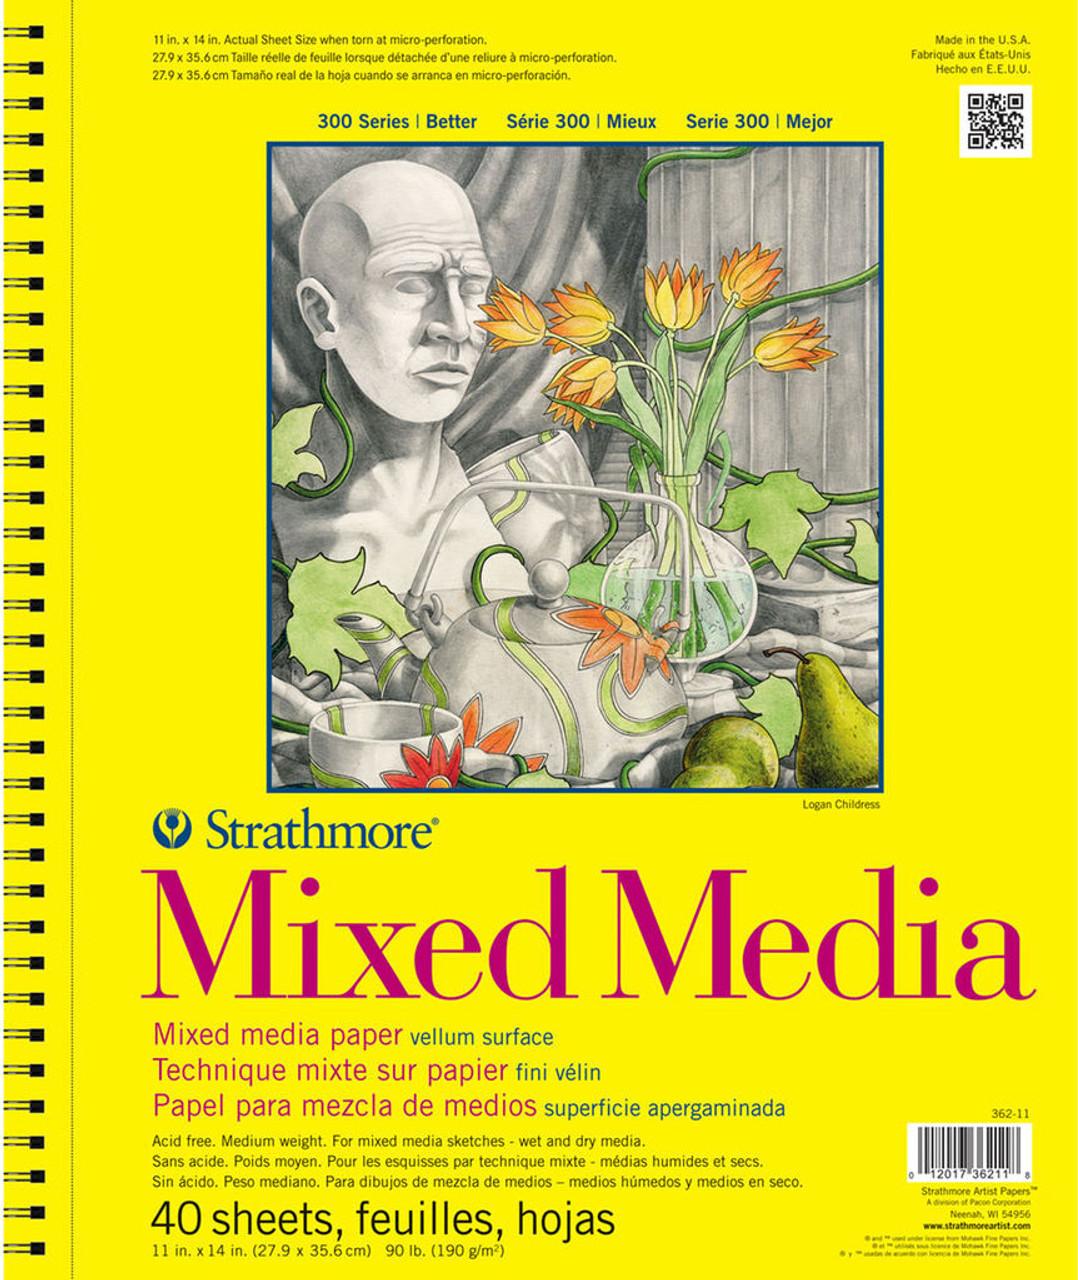 Strathmore 300 Series Mixed Media Pad 11x14